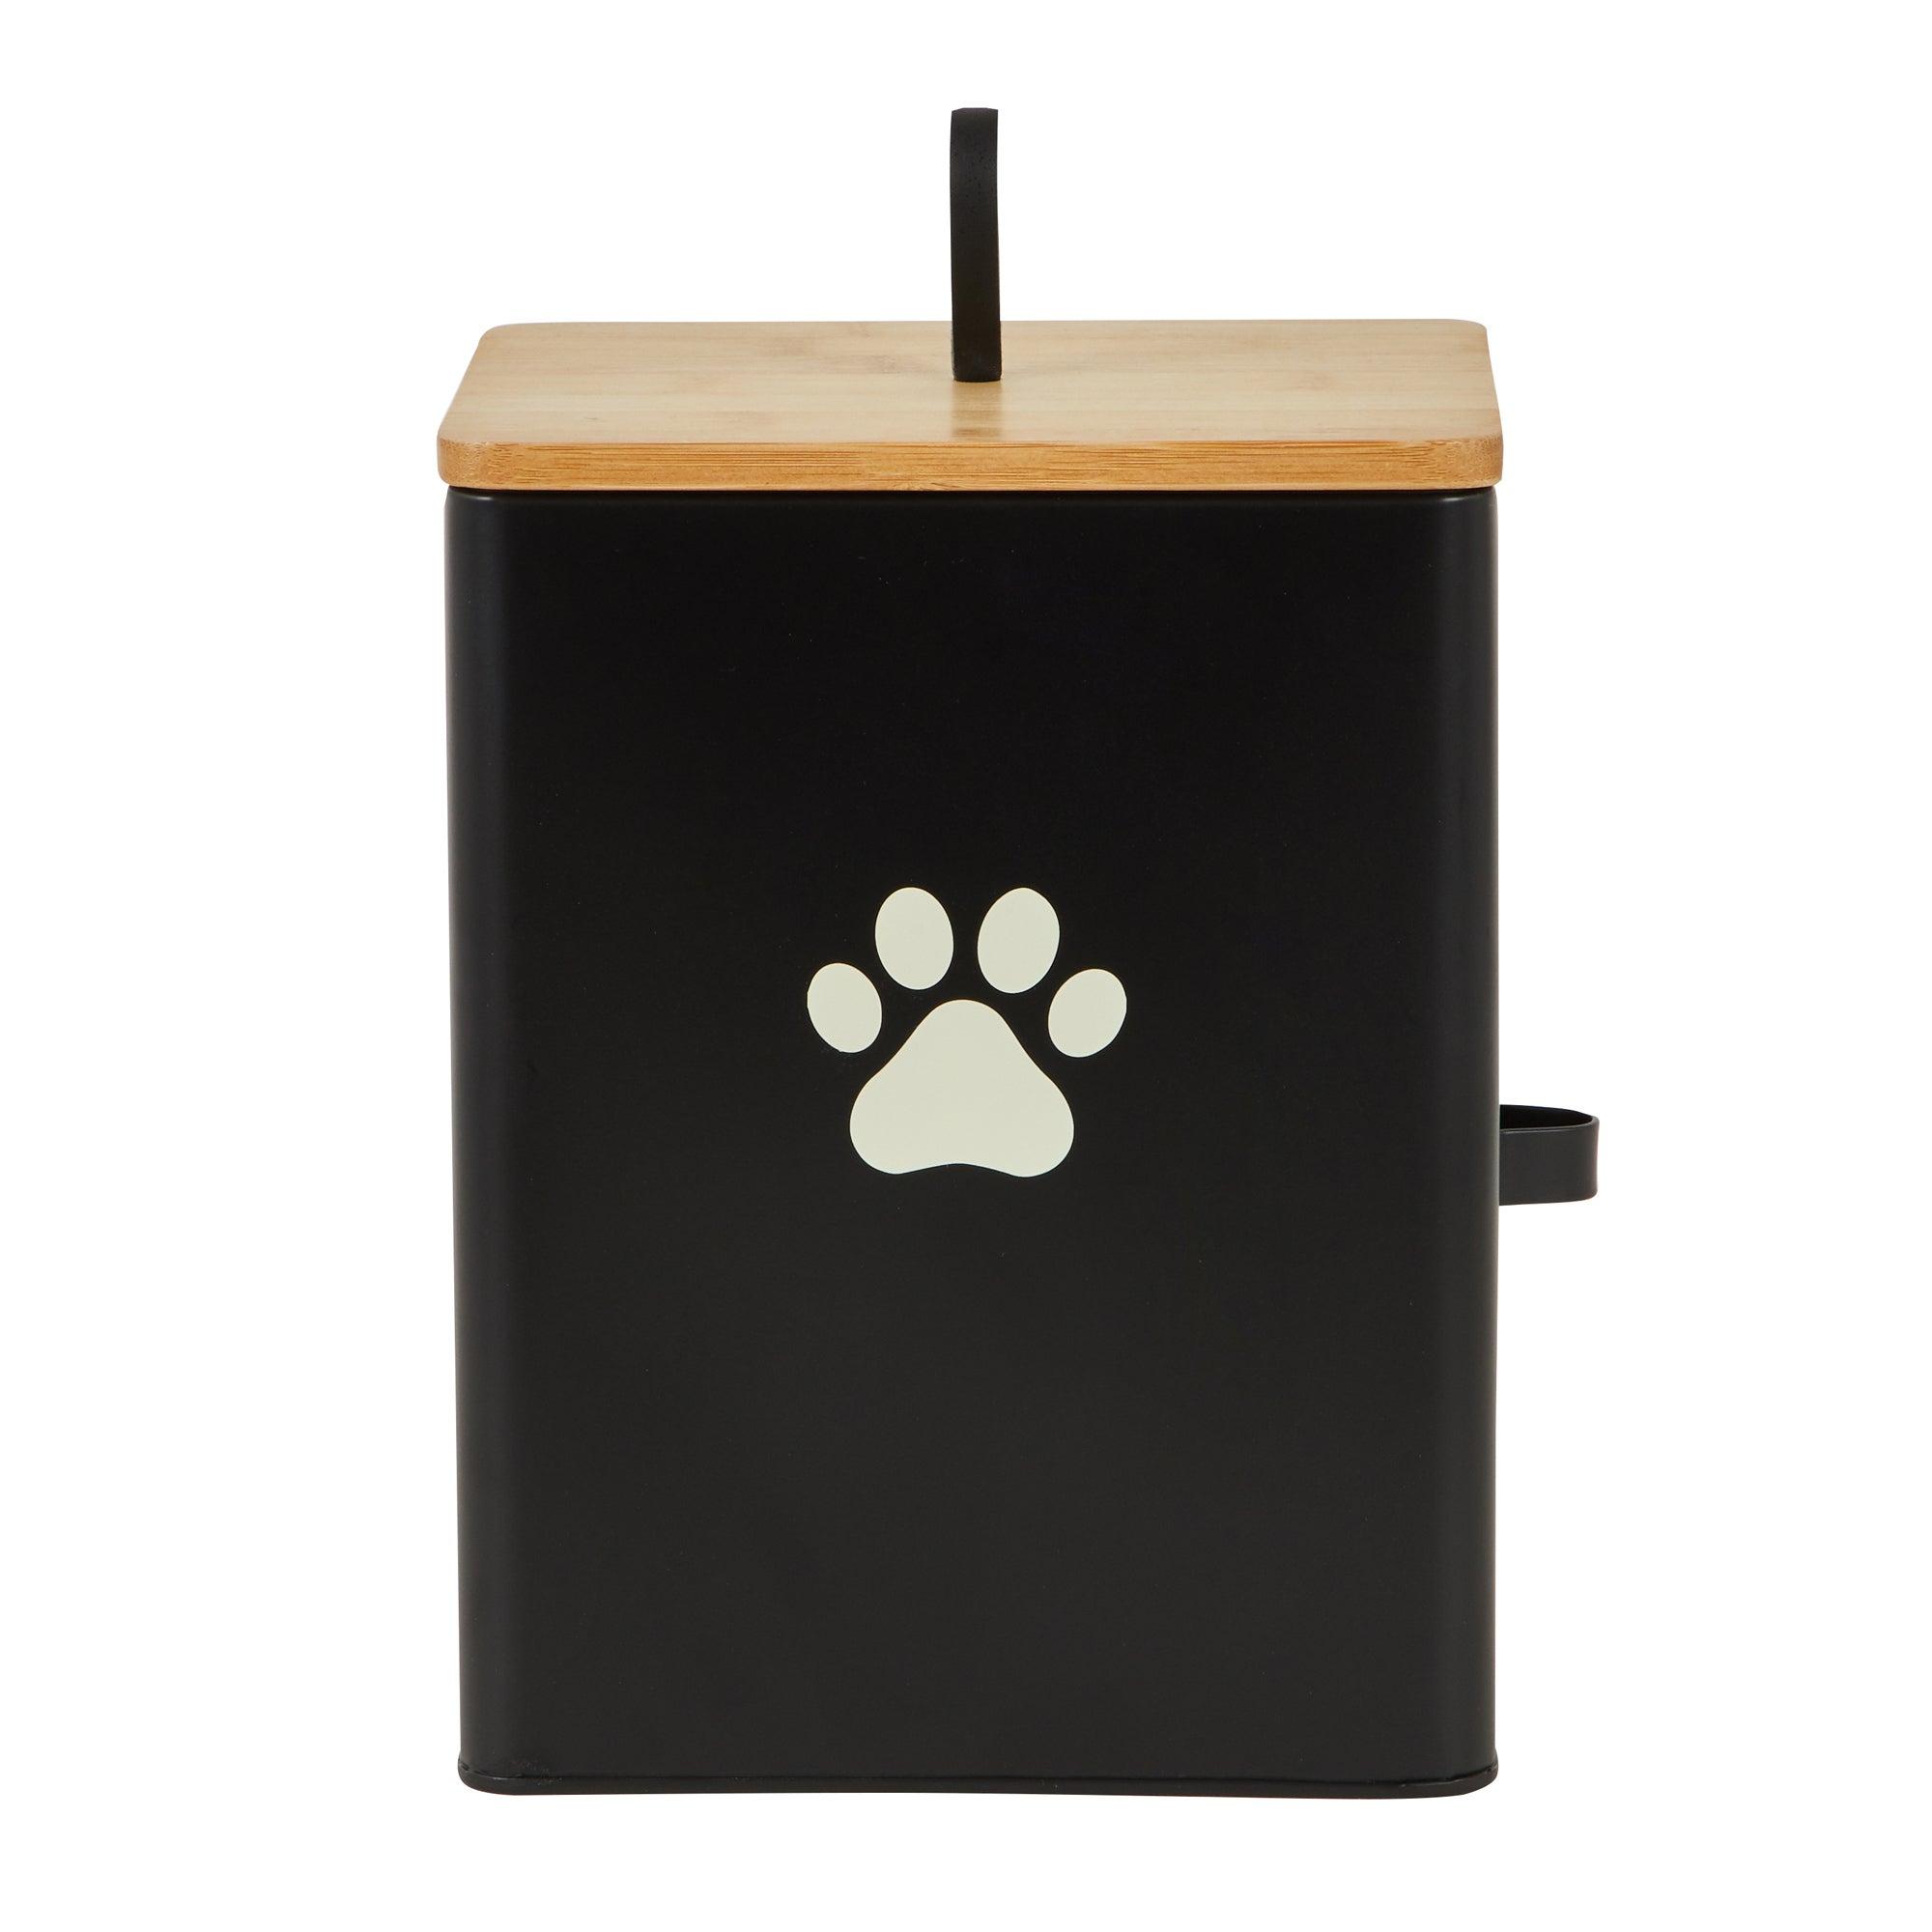 Matt Black Wooden Pet Food Caddy Black